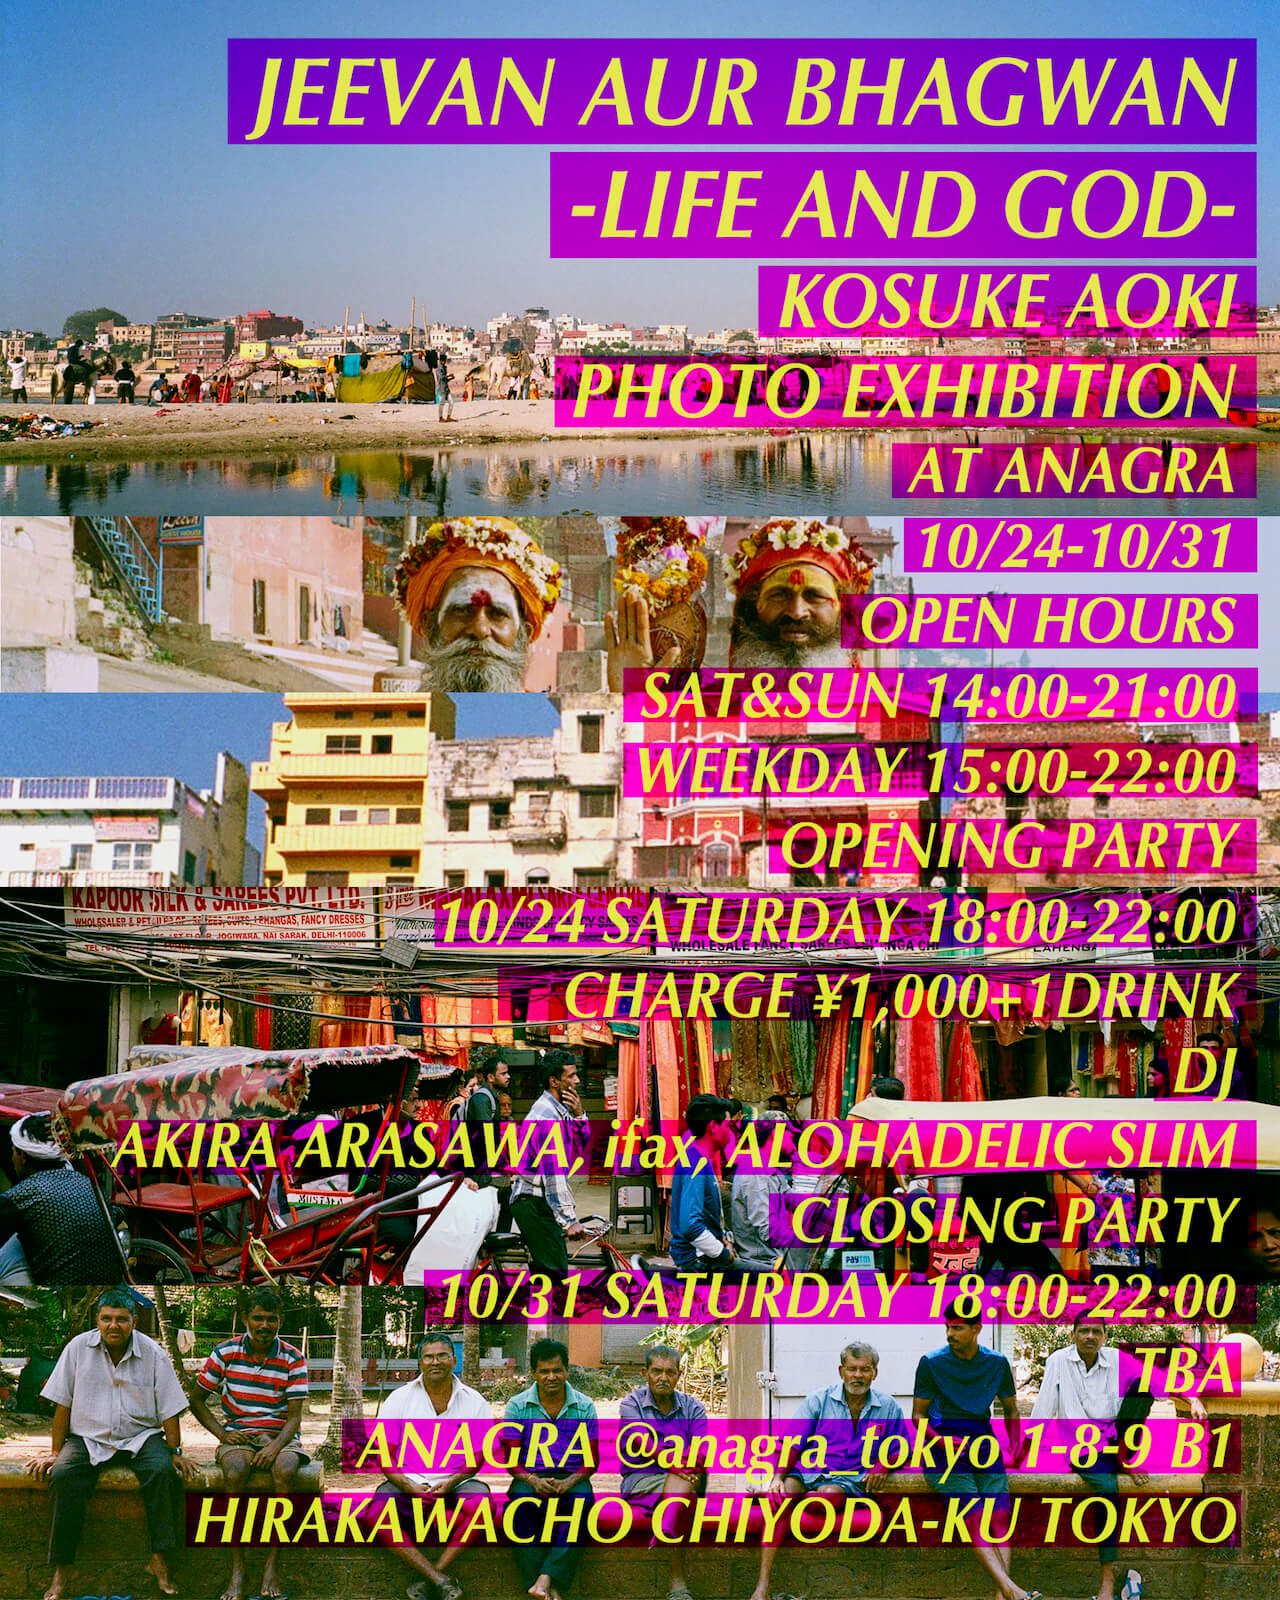 Kosuke Aokiによる写真展&MESS CRIB TOKYOのポップアップがANAGRAにて開催|ゆるふわNENEやヘンタイカメラ♡・アラサワアキラらも登場 art-culture201012-jeevan-aur-bhagwan-2-1